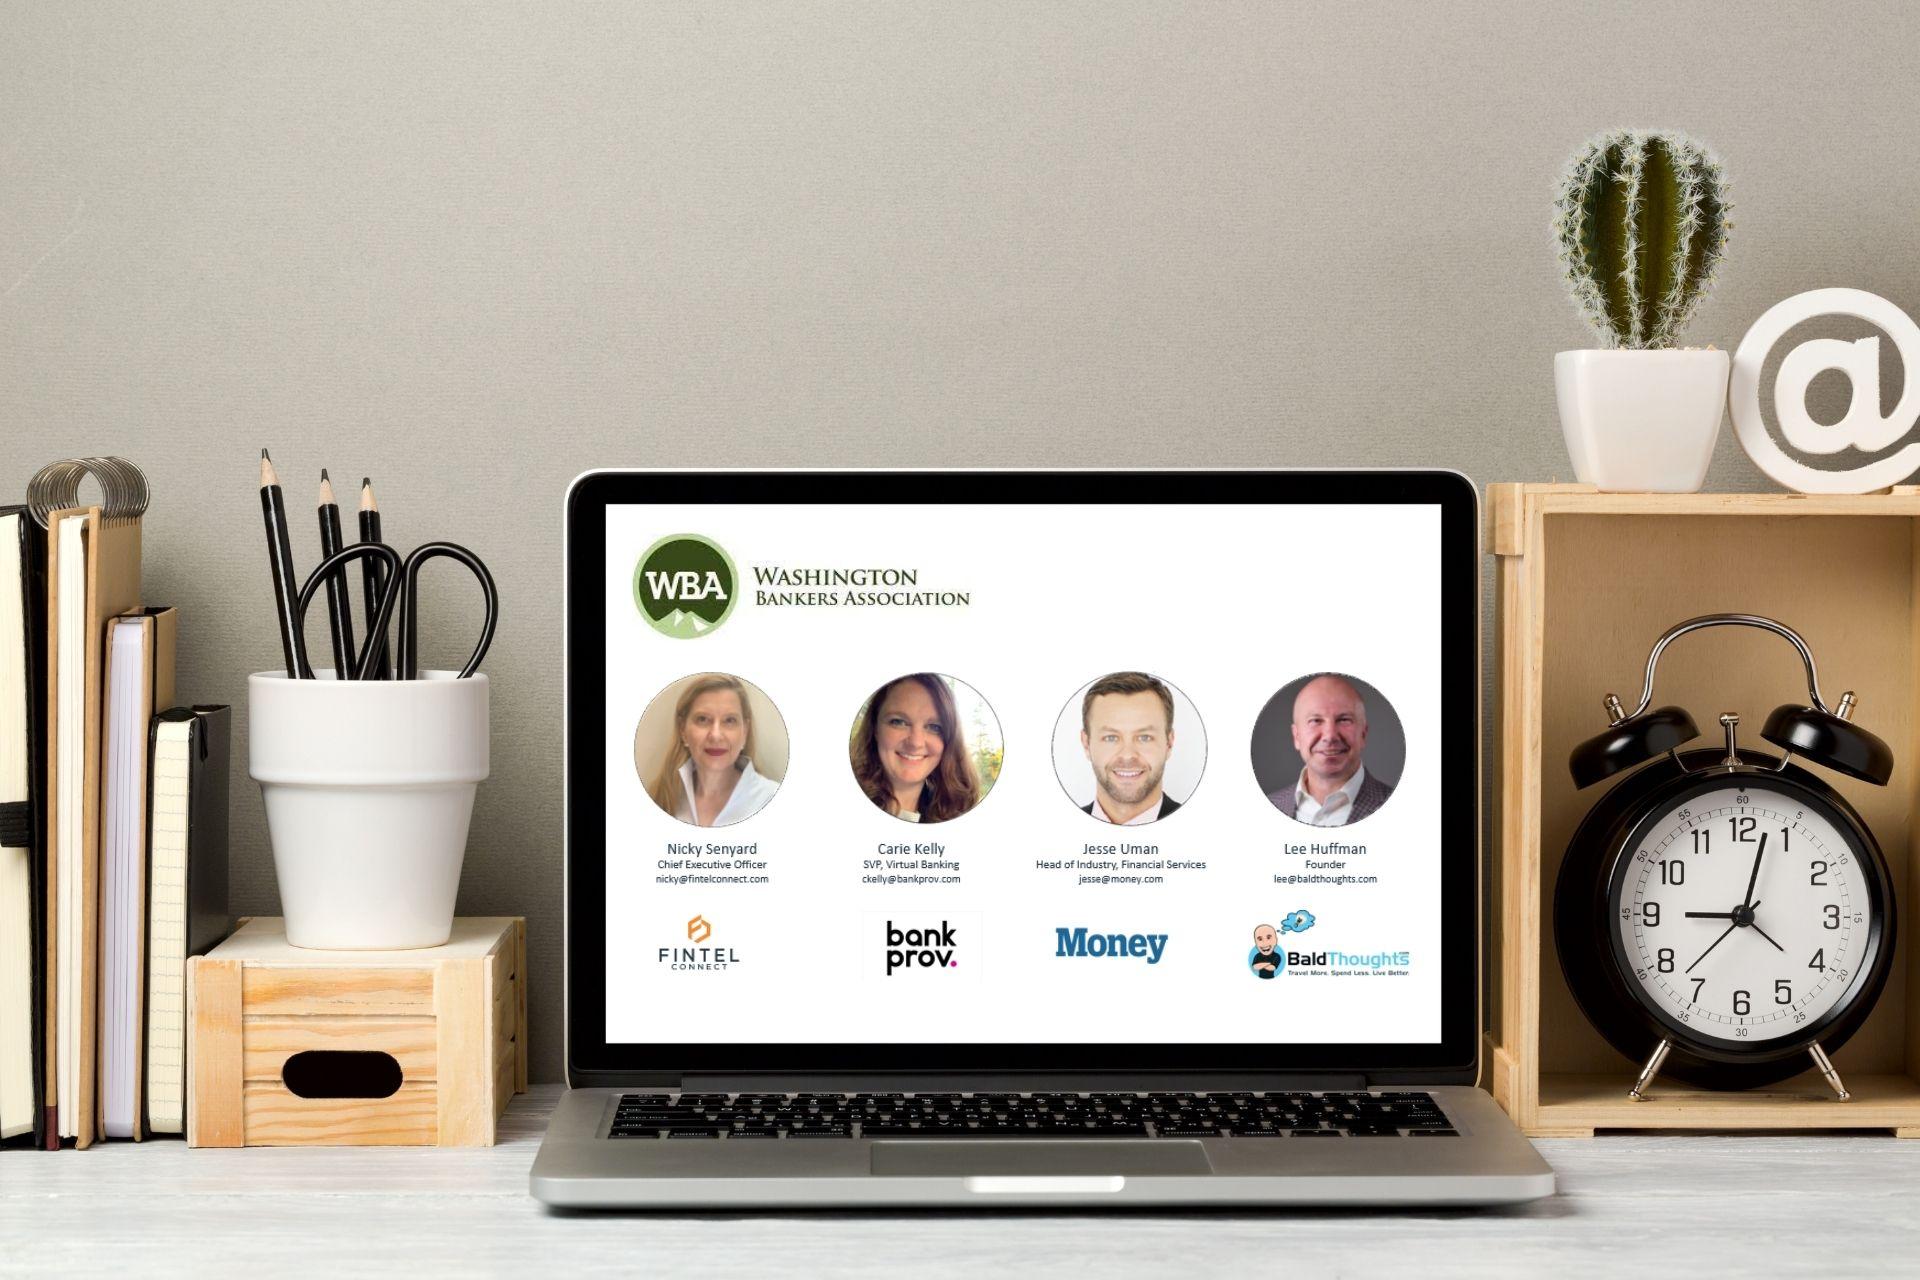 Webinar Recap: Influencer Marketing for Banks and Financial Institutions